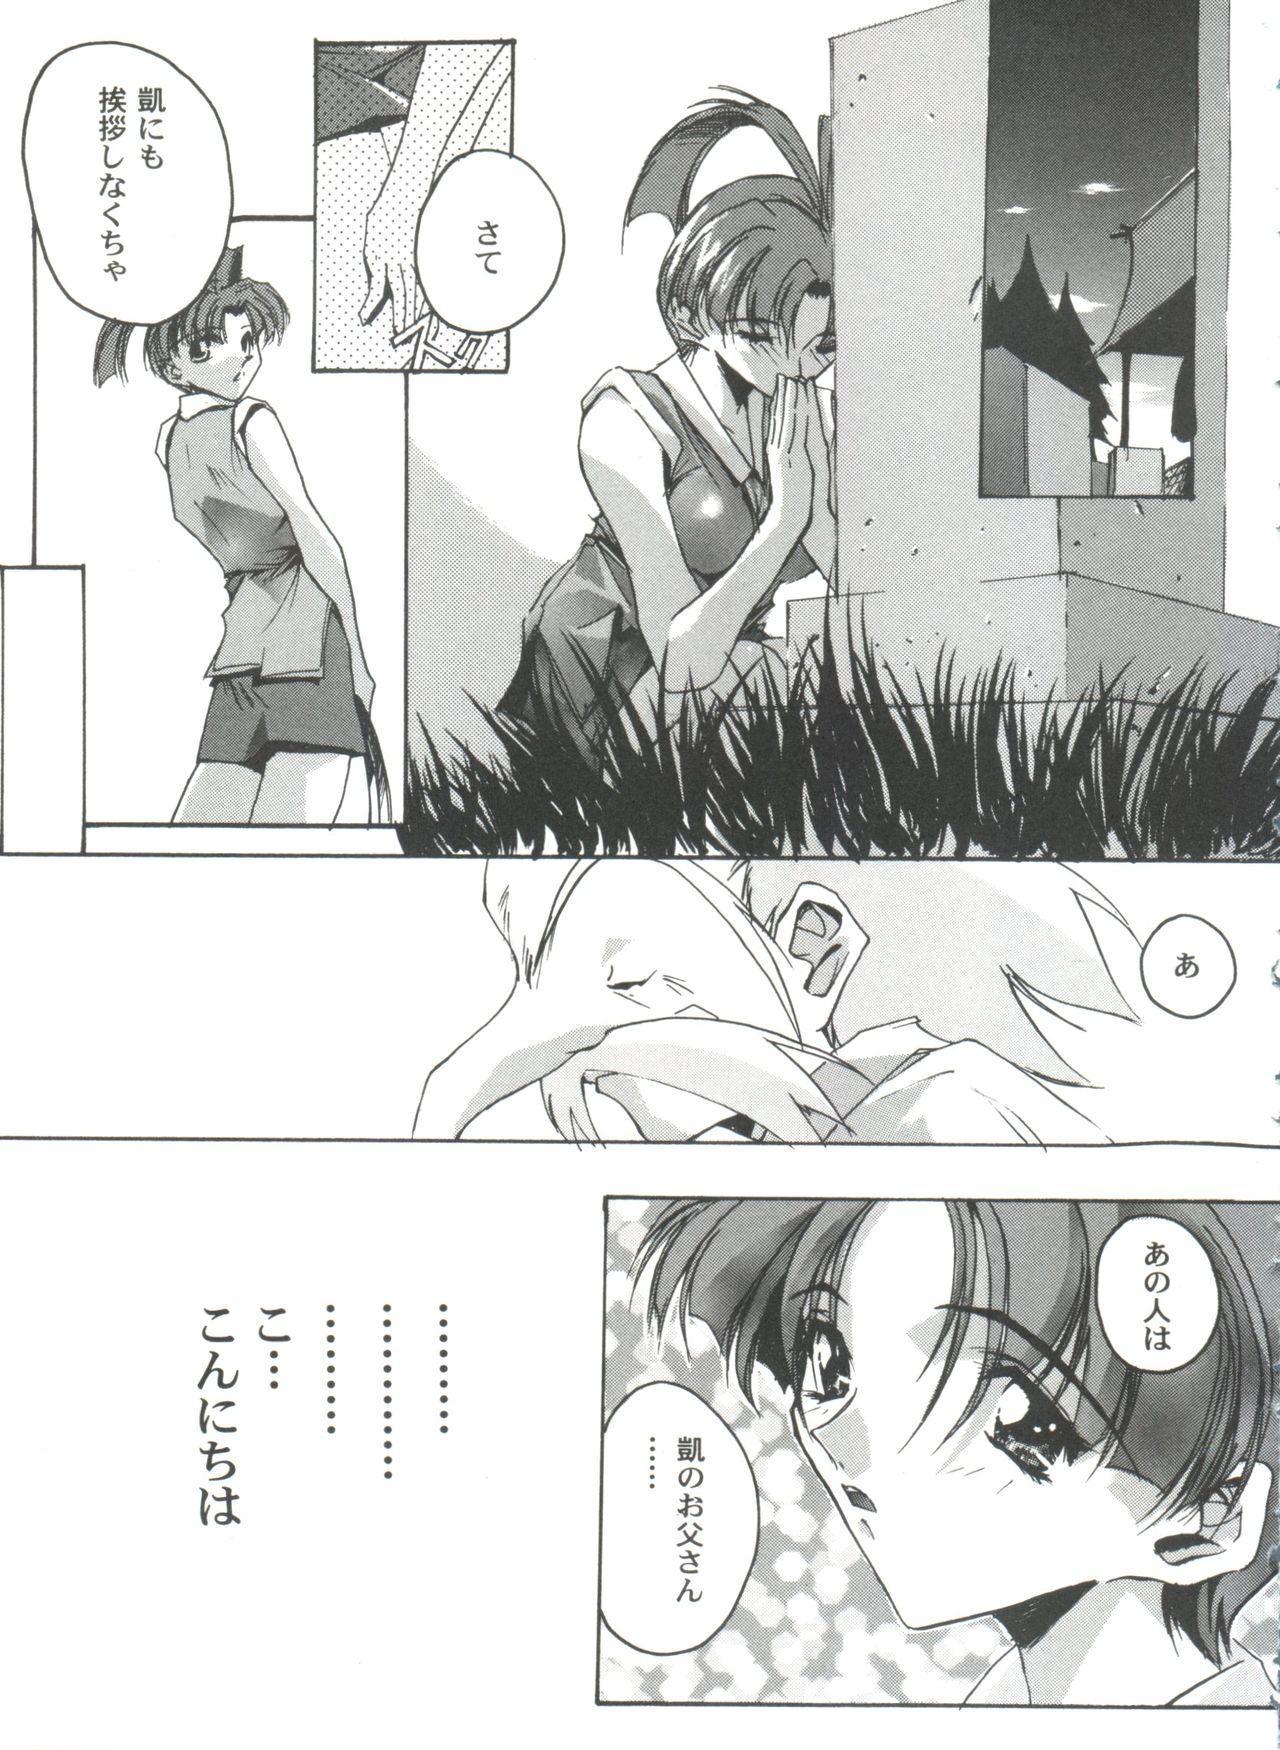 Girl's Parade 99 Cut 12 16